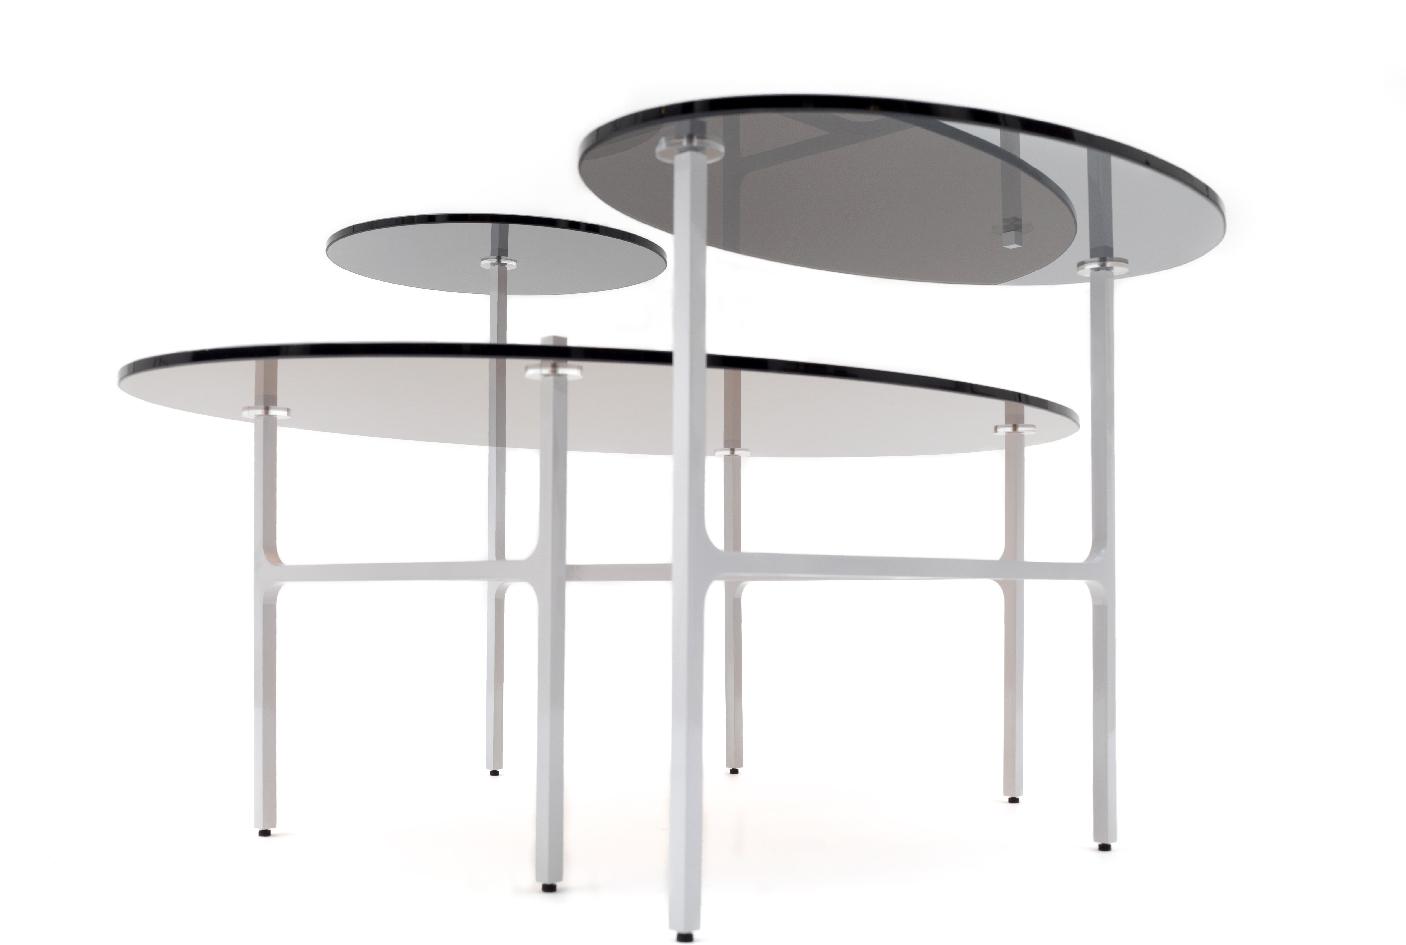 Luna Nesting Table_Comp6-01.jpg